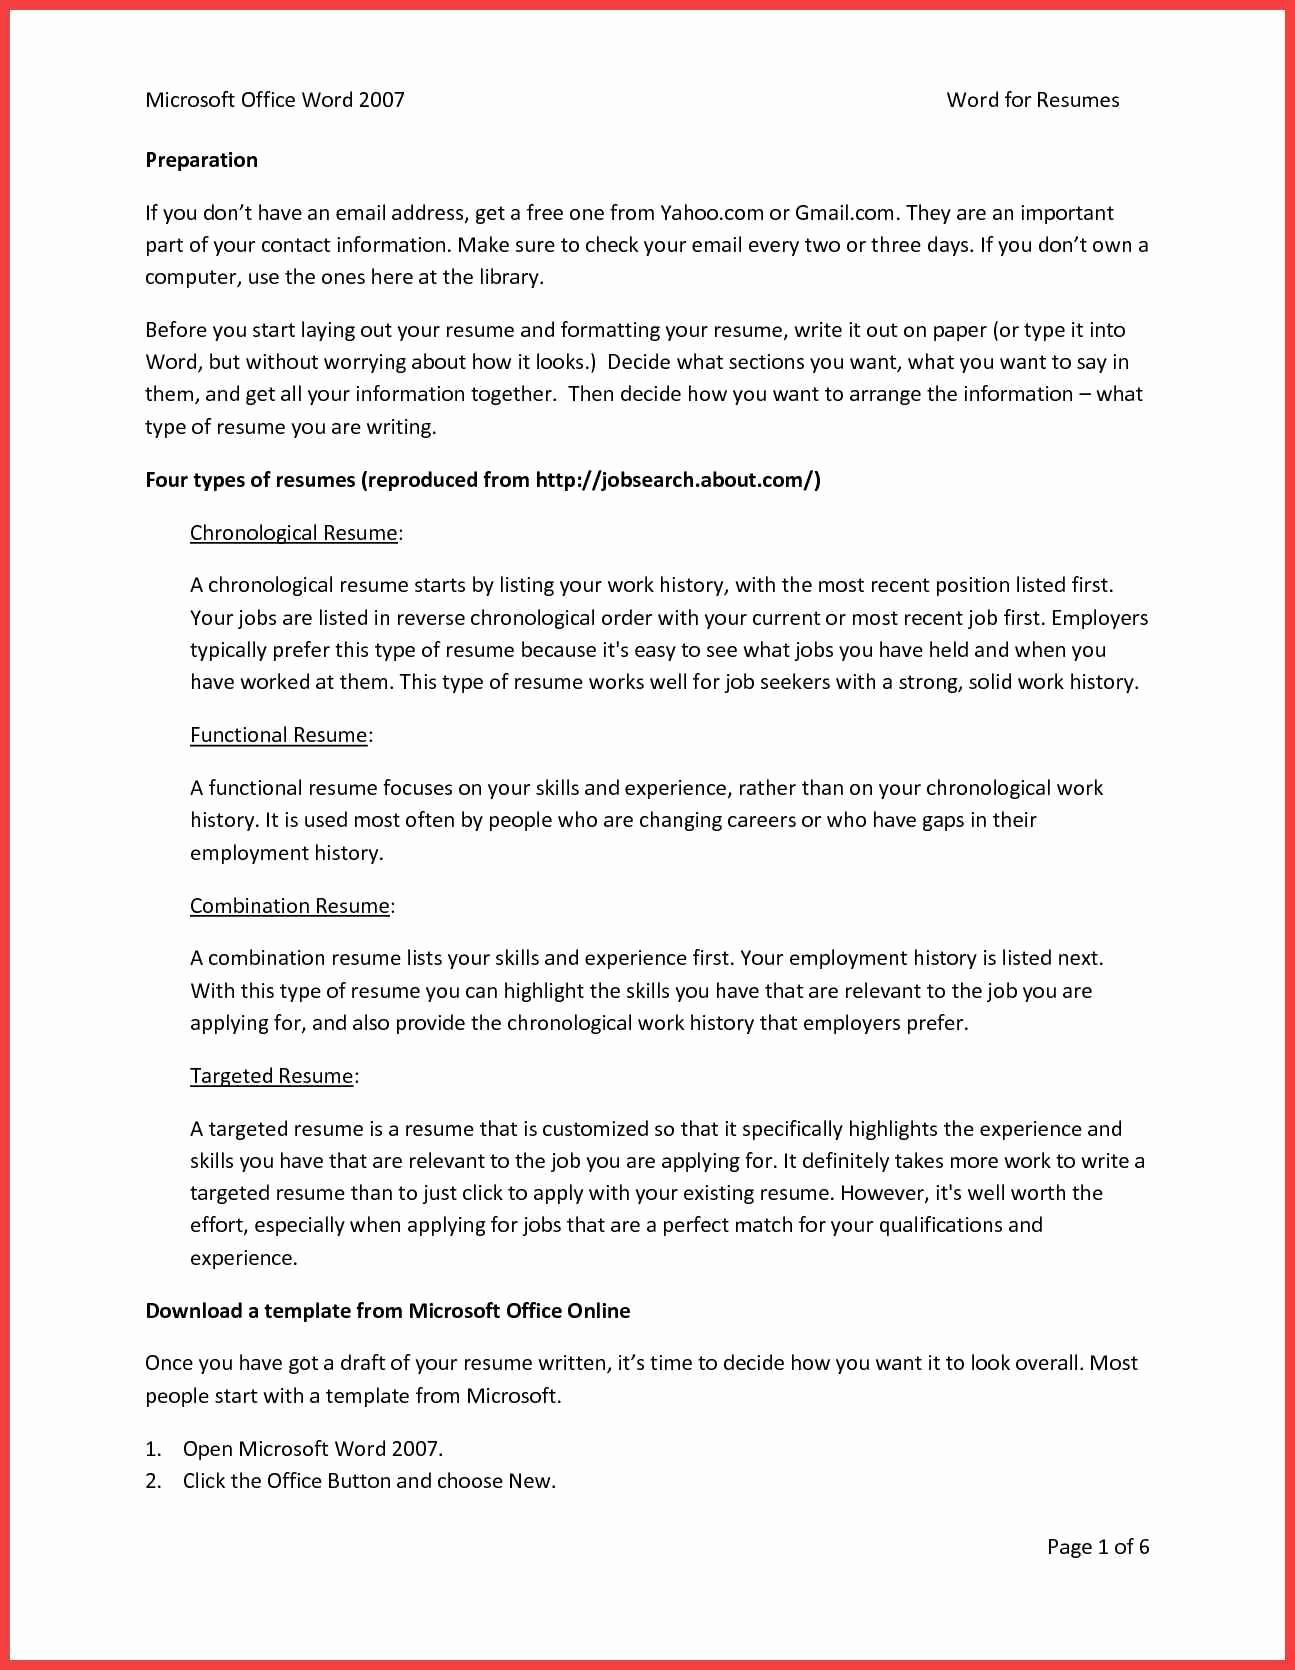 Resumes On Microsoft Word 2007 Fresh Skills Resume Template Word